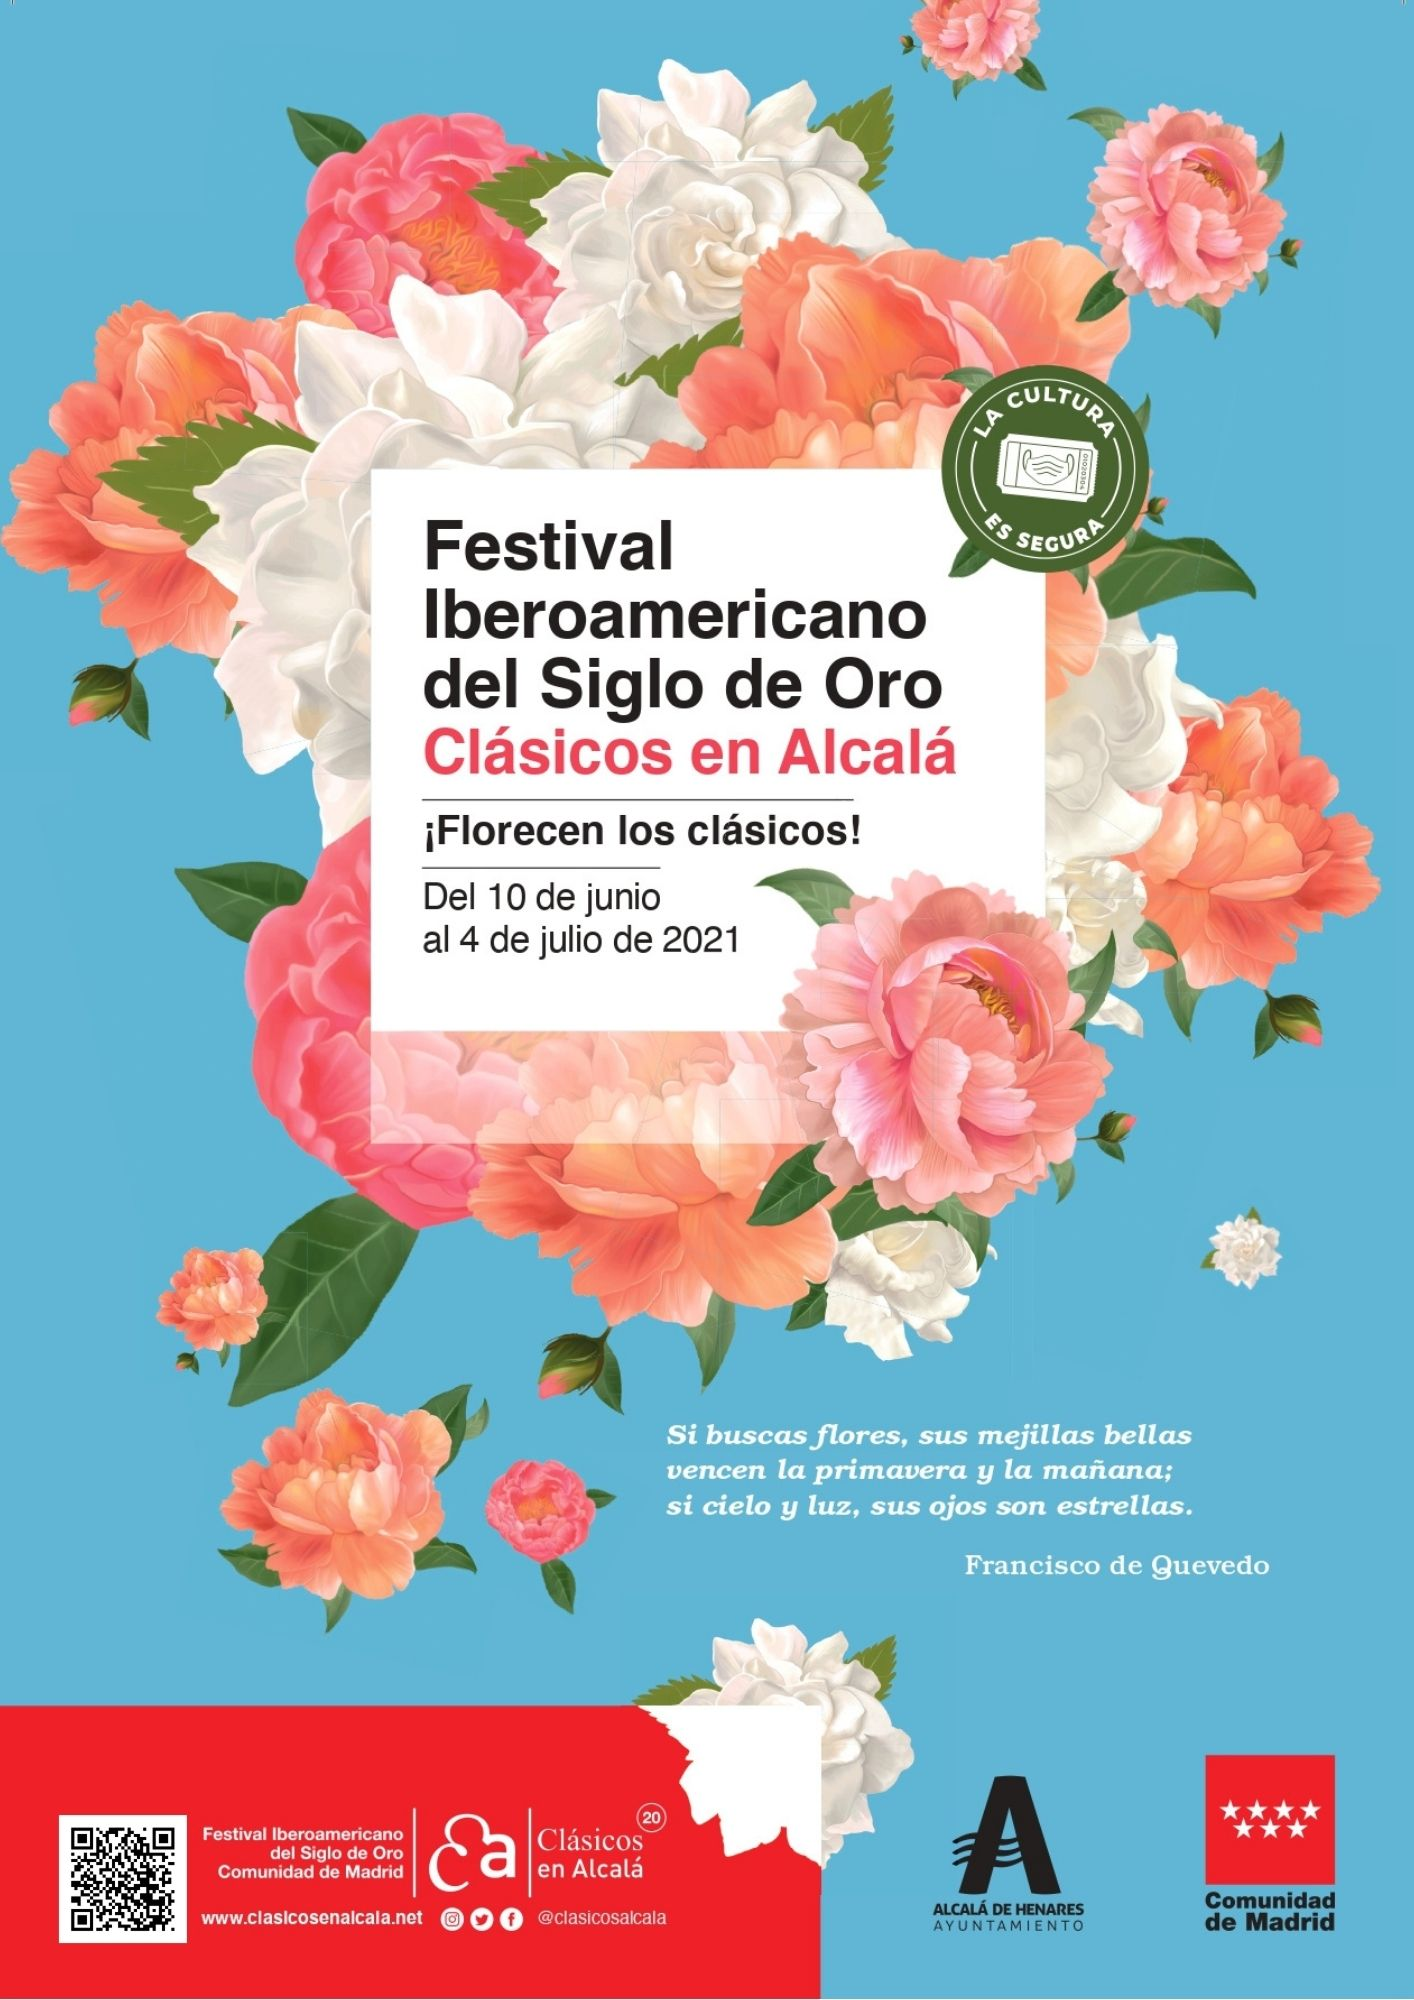 Festival Iberoamericano del Siglo de Oro, clásicos en Alcalá